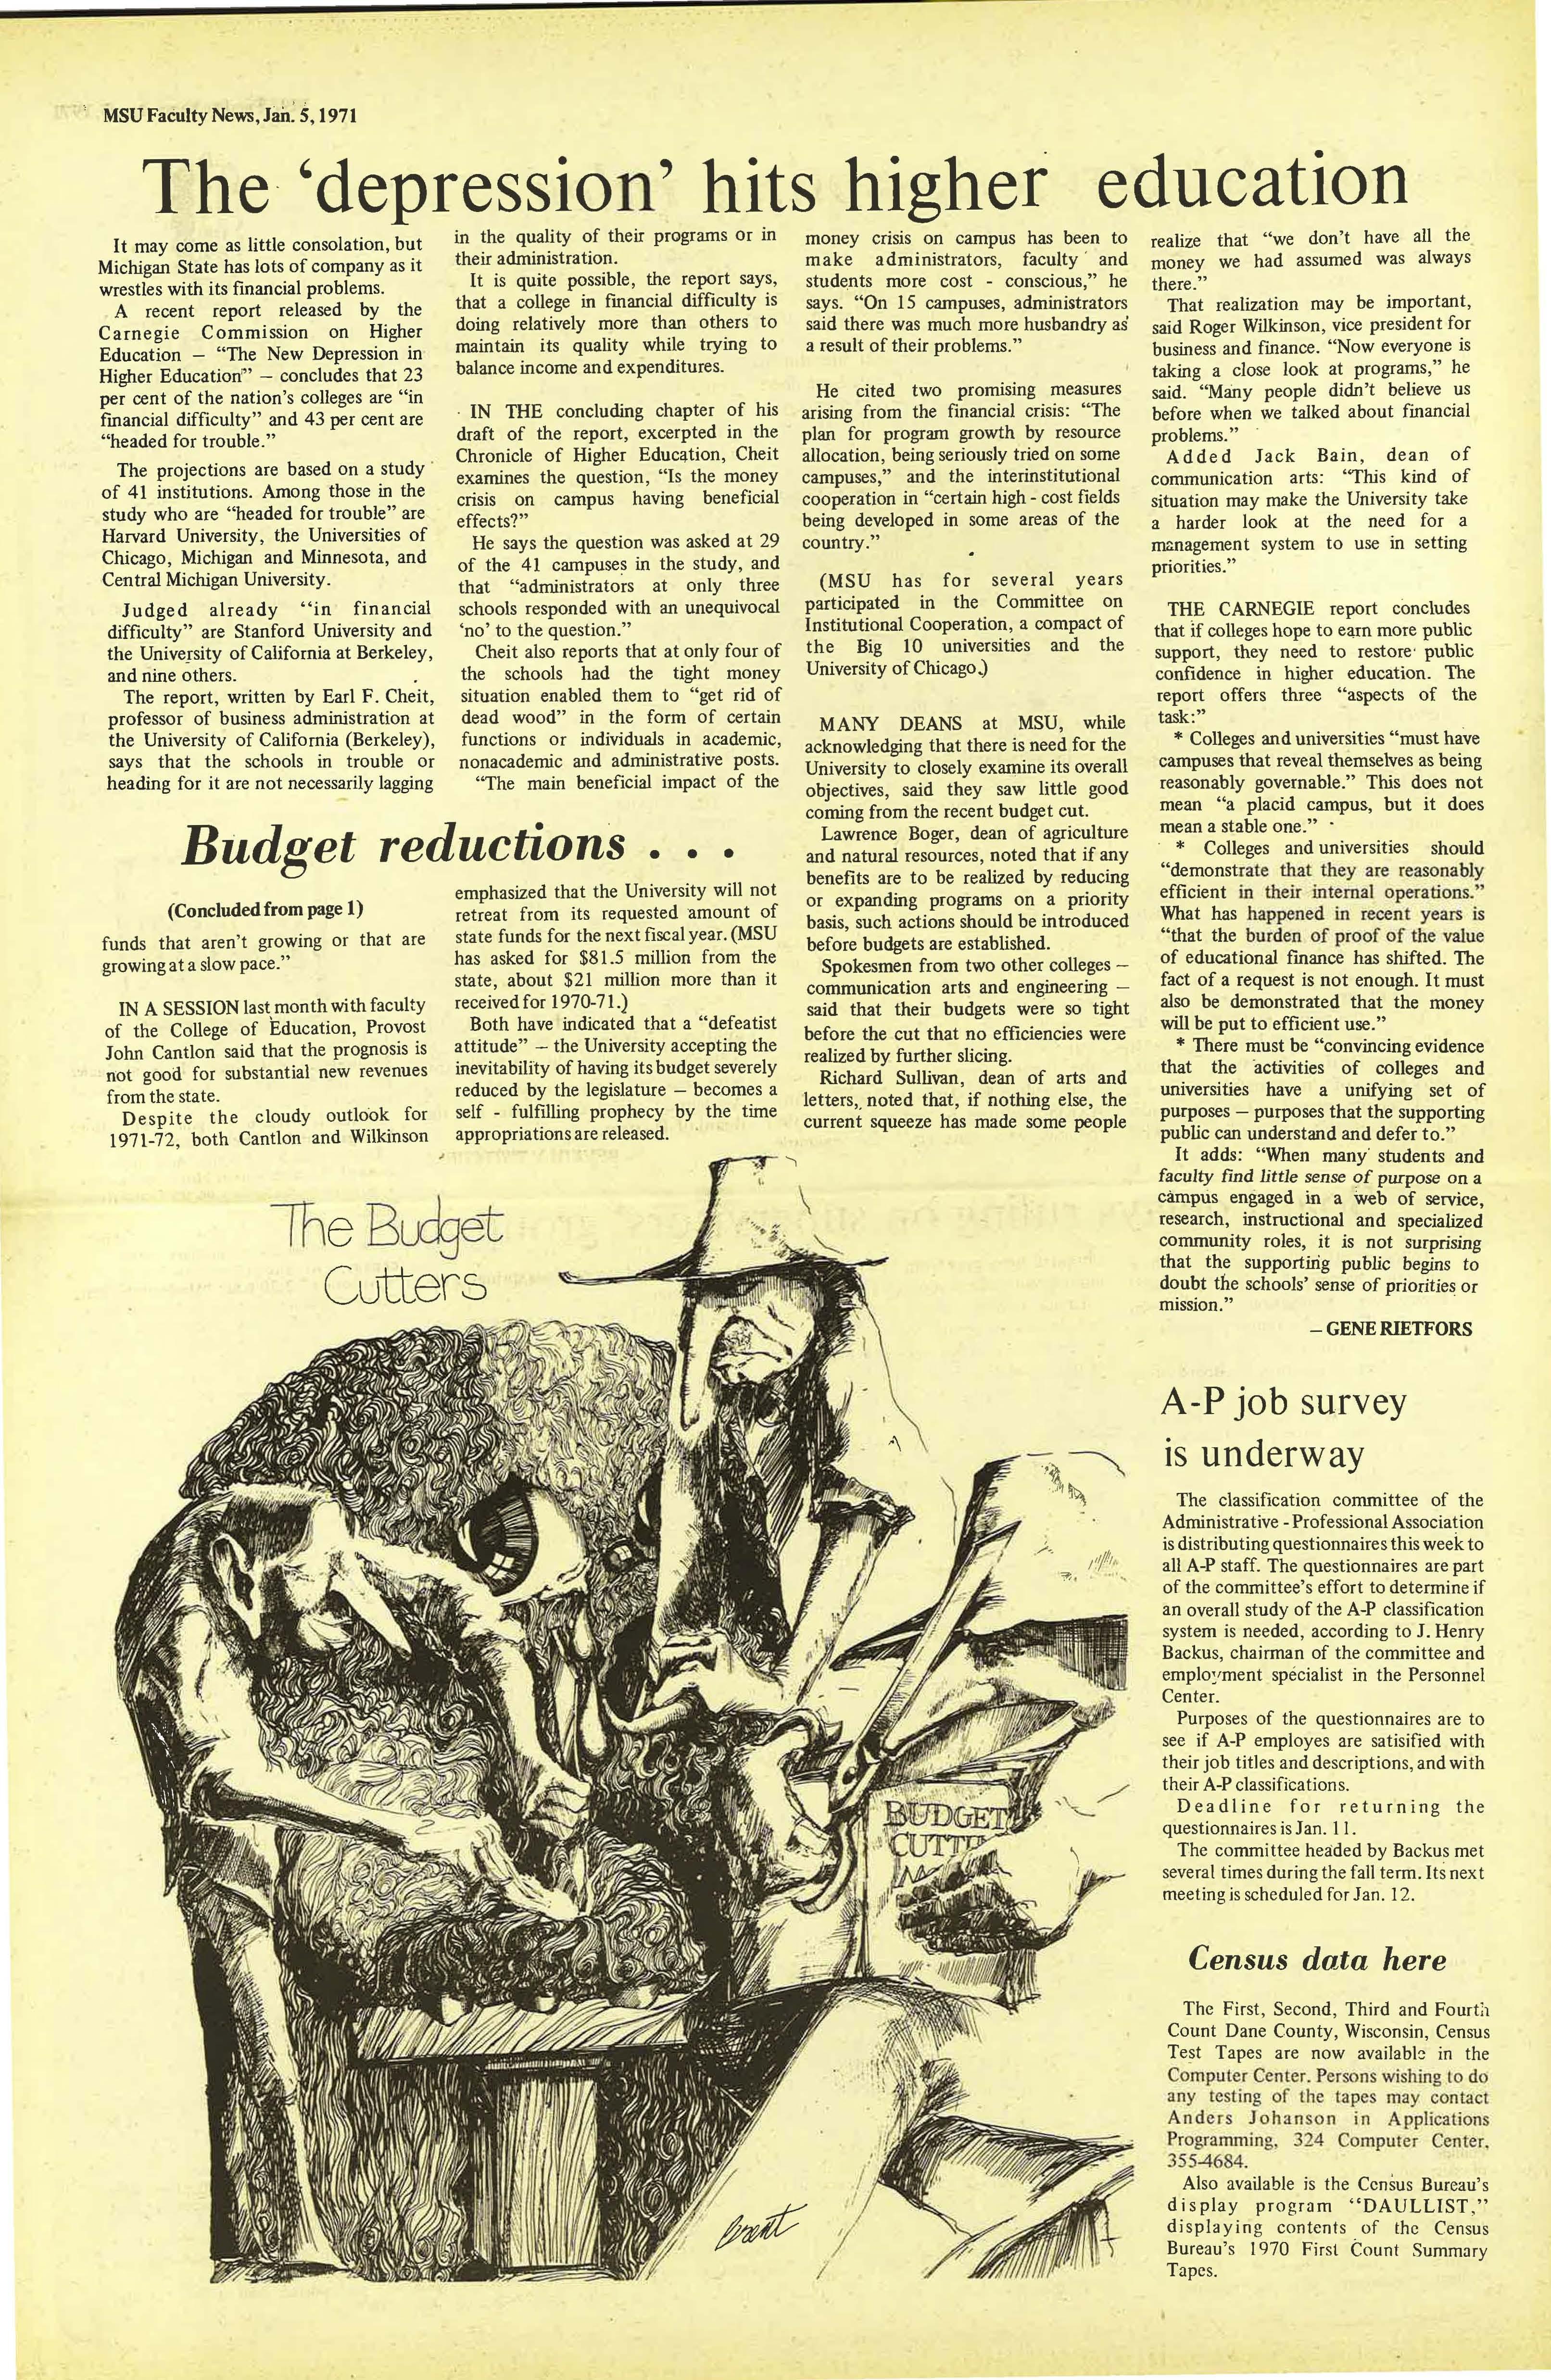 MSU News Bulletin, vol. 2, No. 32, July 15, 1971